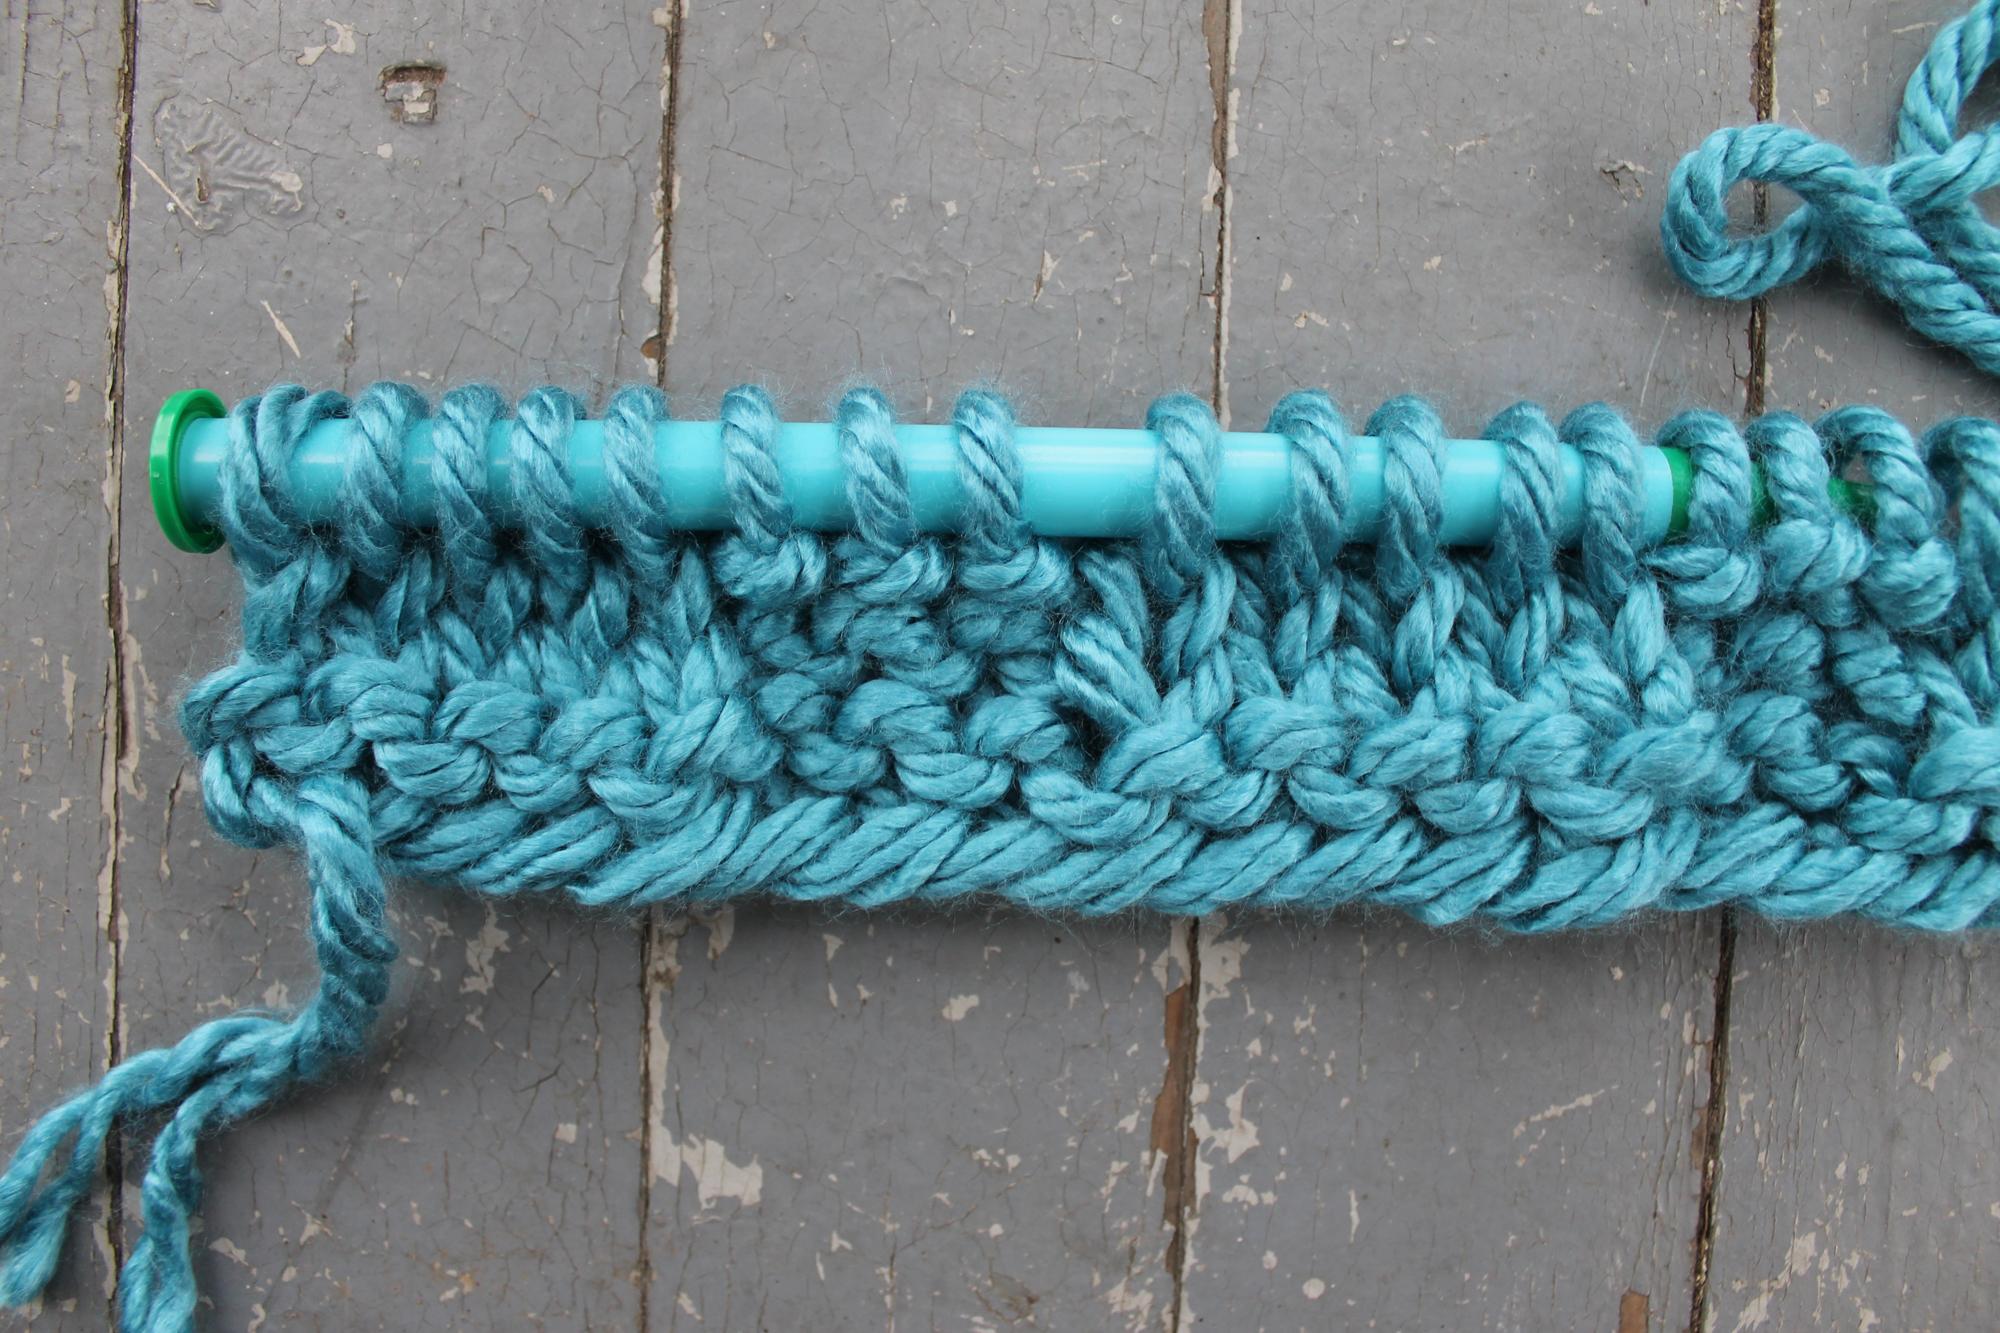 Basketweave knitting stitch row 2